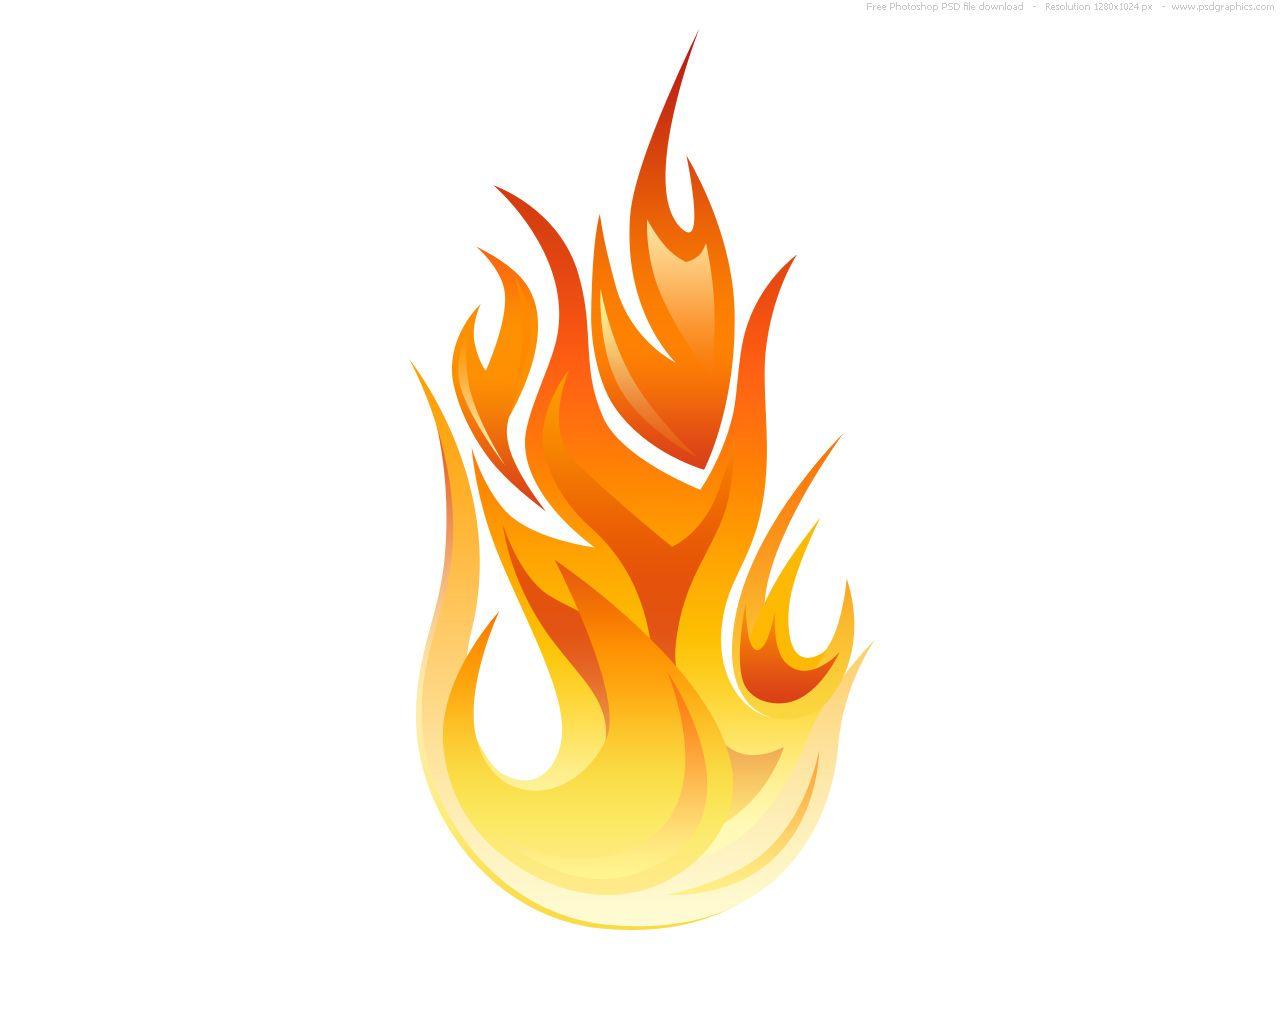 Psd Flame Icon Psdgraphics Flame Tattoos Fire Icons Flame Art